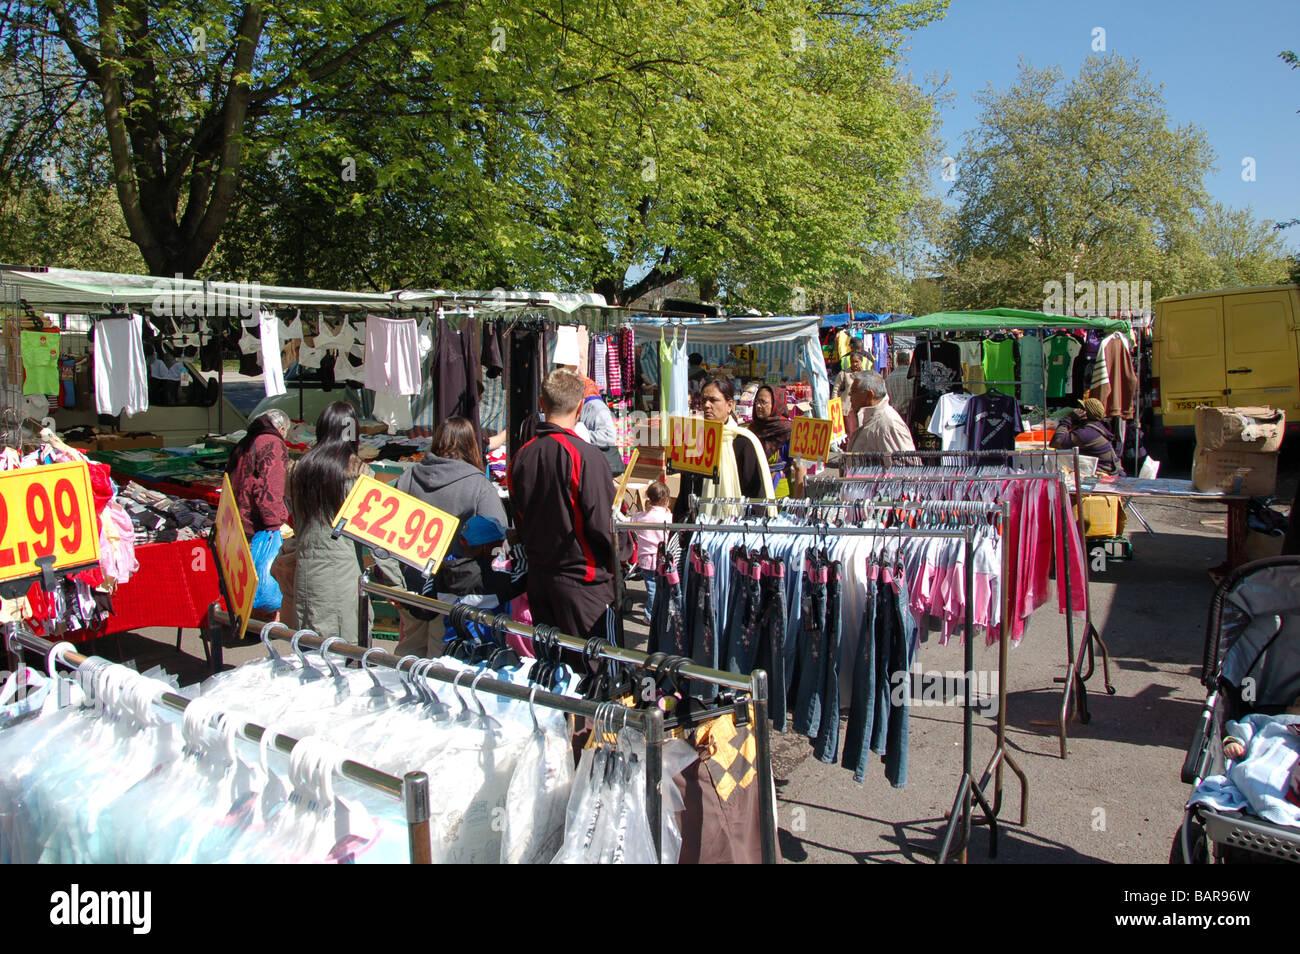 Wednesday's Church road market in Willesden, London, England, Uk - Stock Image